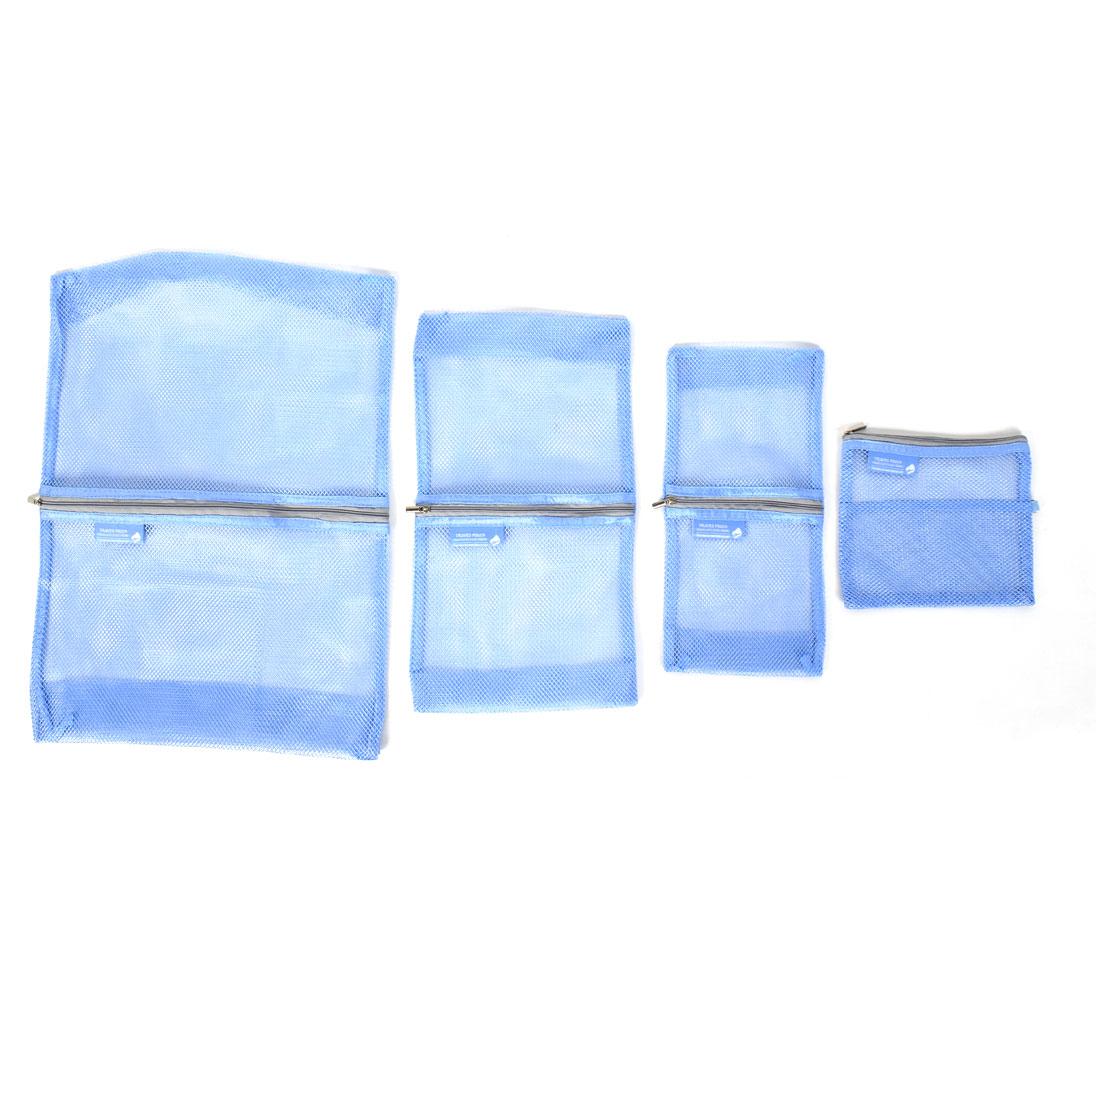 Multifunctional Travel Mesh Storage Bag Luggage Case Blue 4 in 1